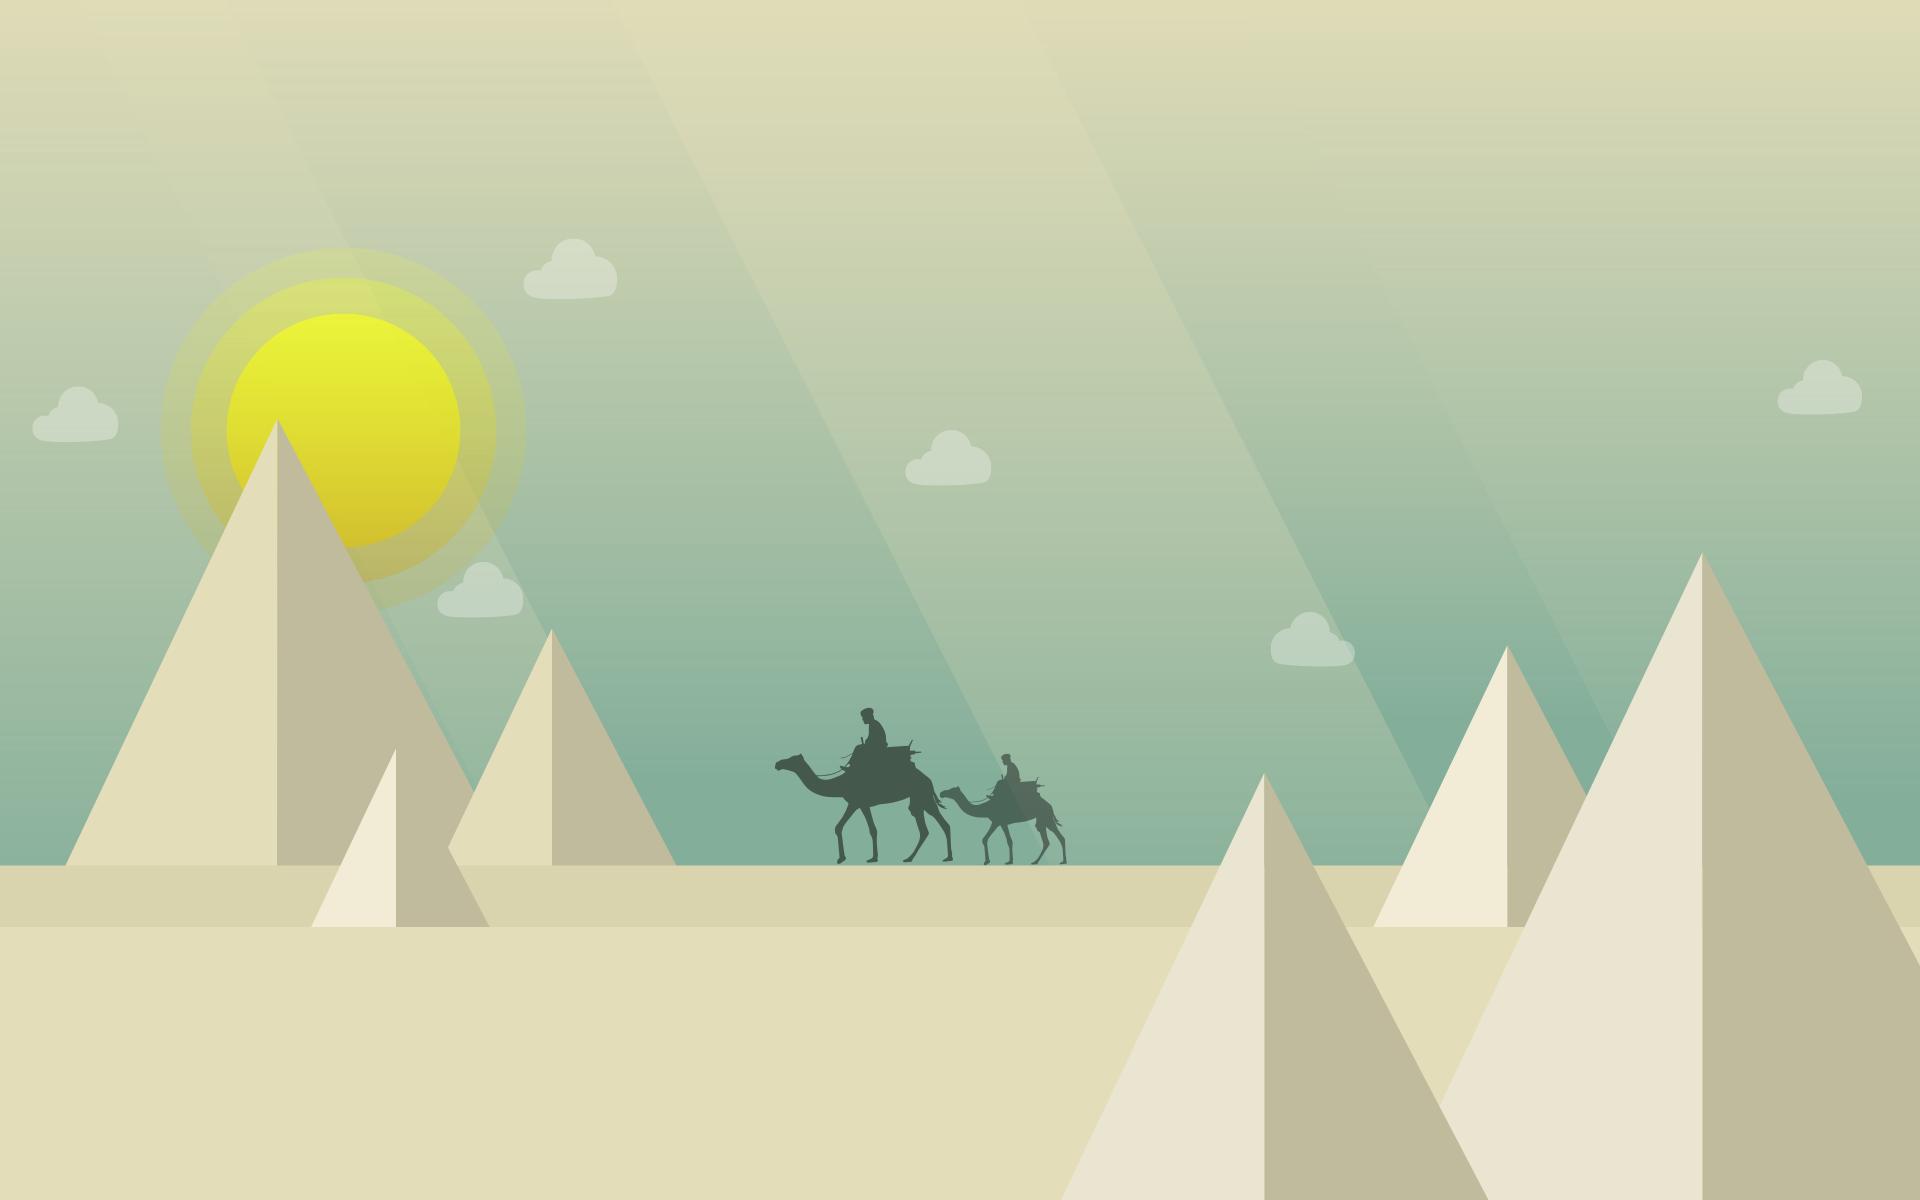 रेगिस्तान, ऊंट, पिरामिड, सूर्य, बादल - HD वॉलपेपर - प्रोफेसर-falken.com